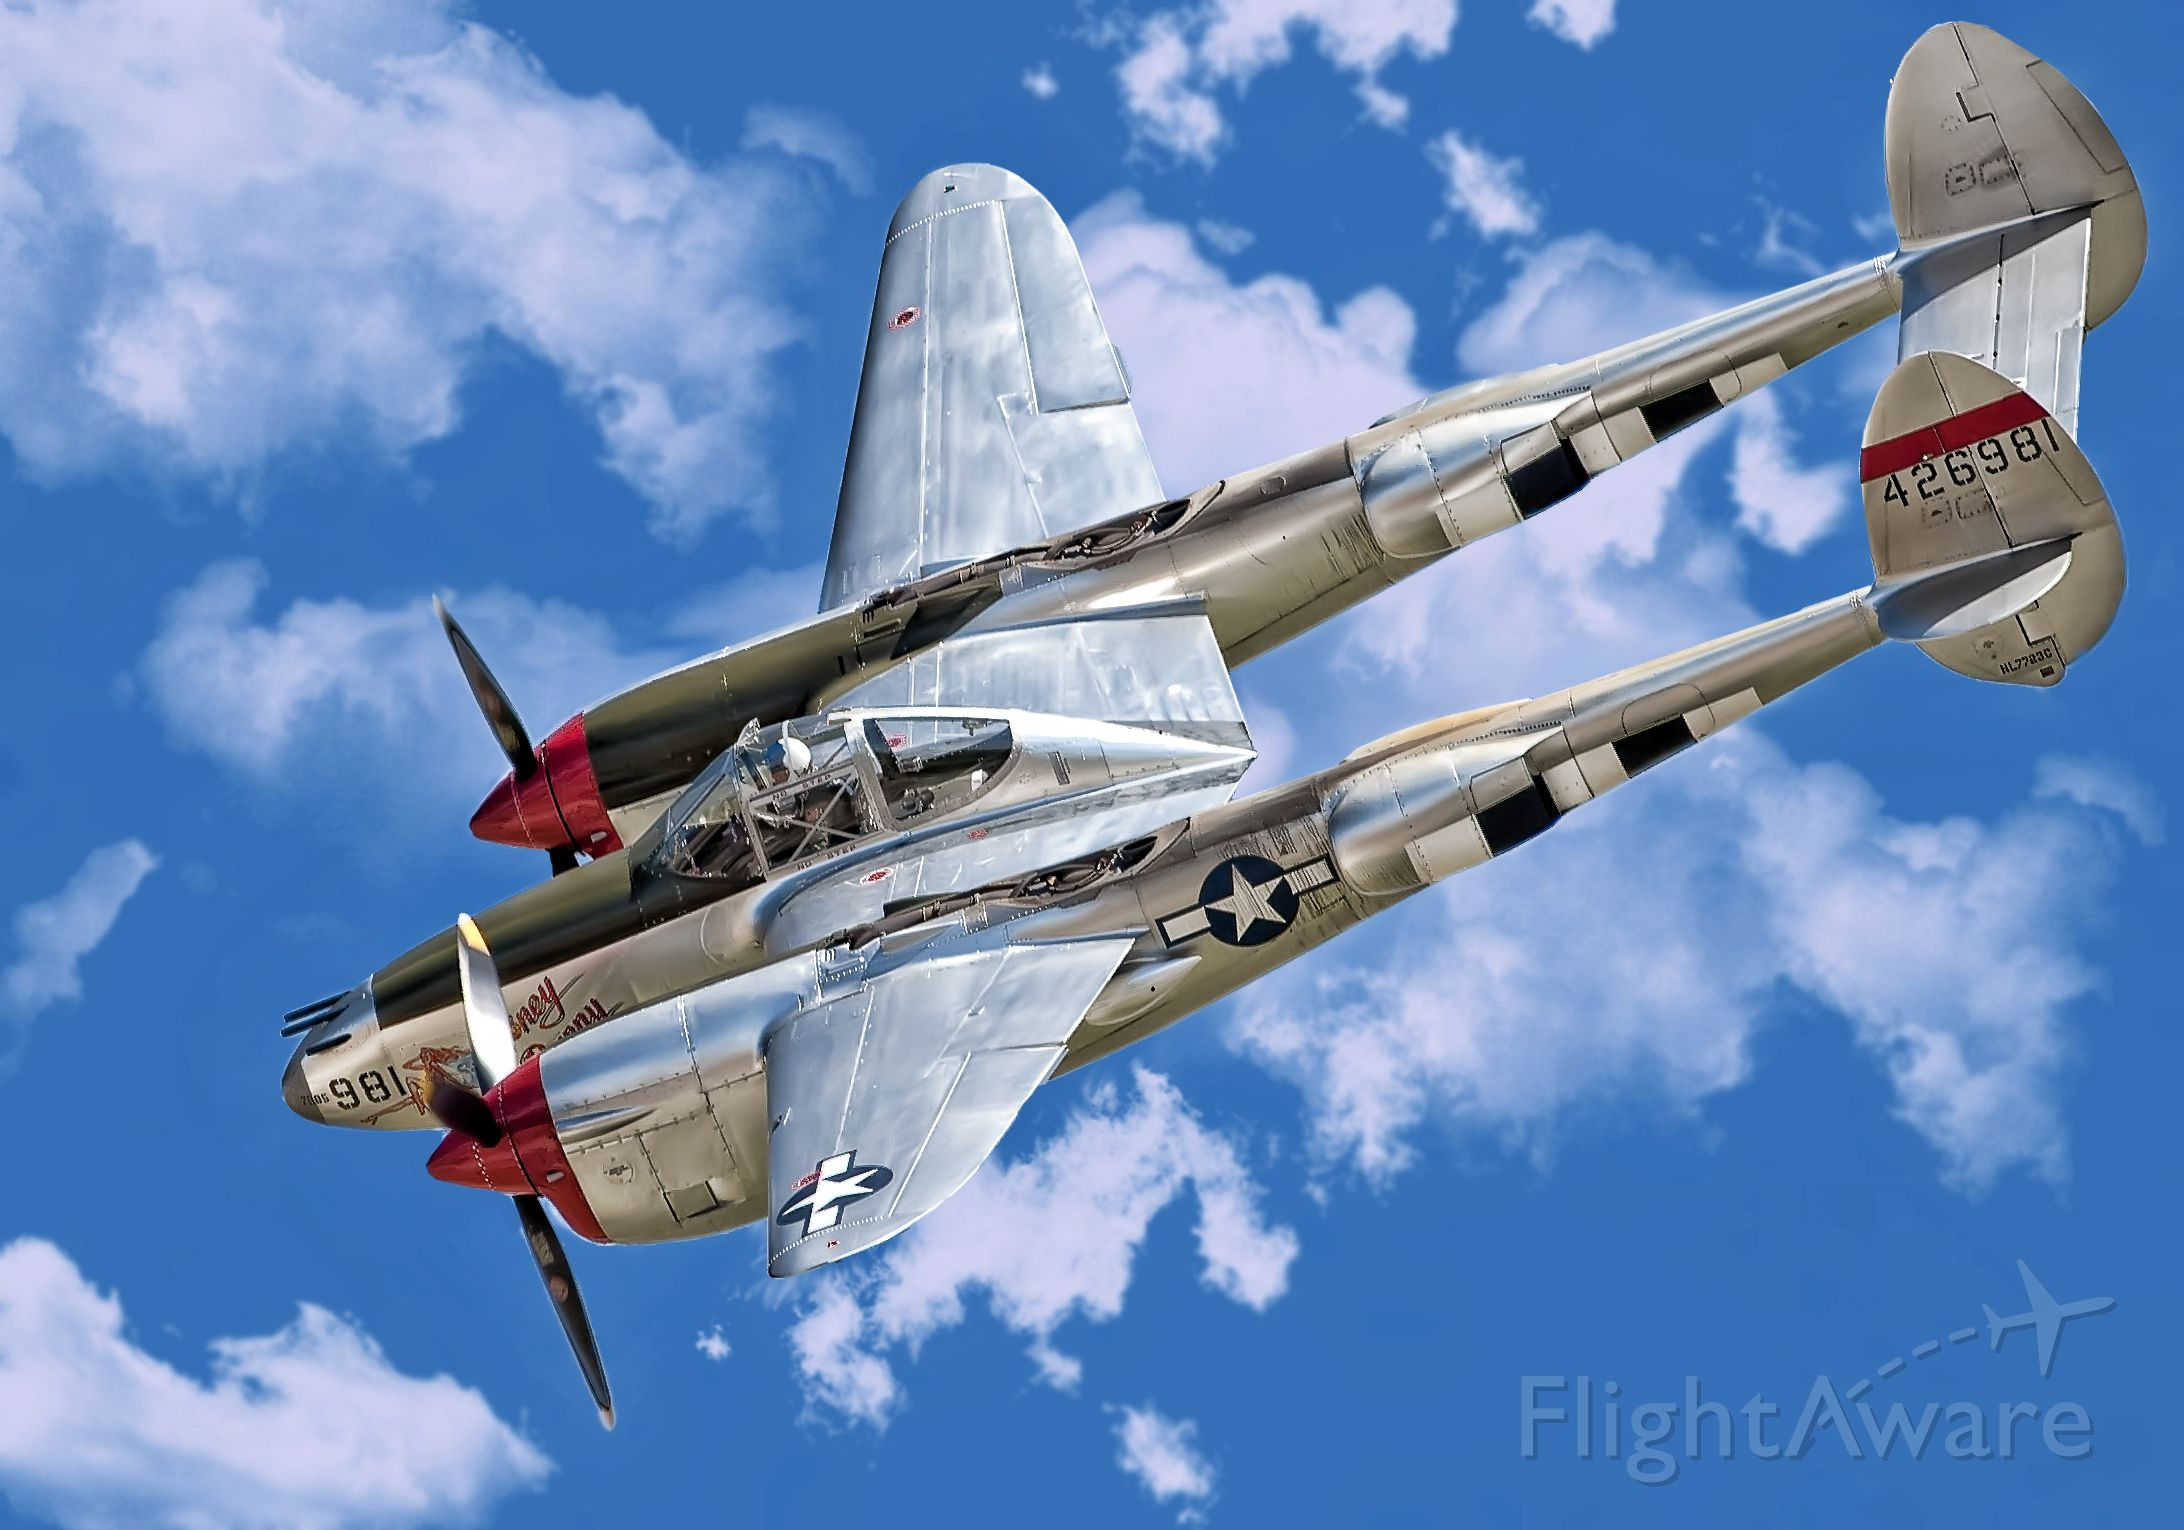 Lockheed P-38 Lightning (NL7723C) - Lockheed P-38 Over Chino, Ca